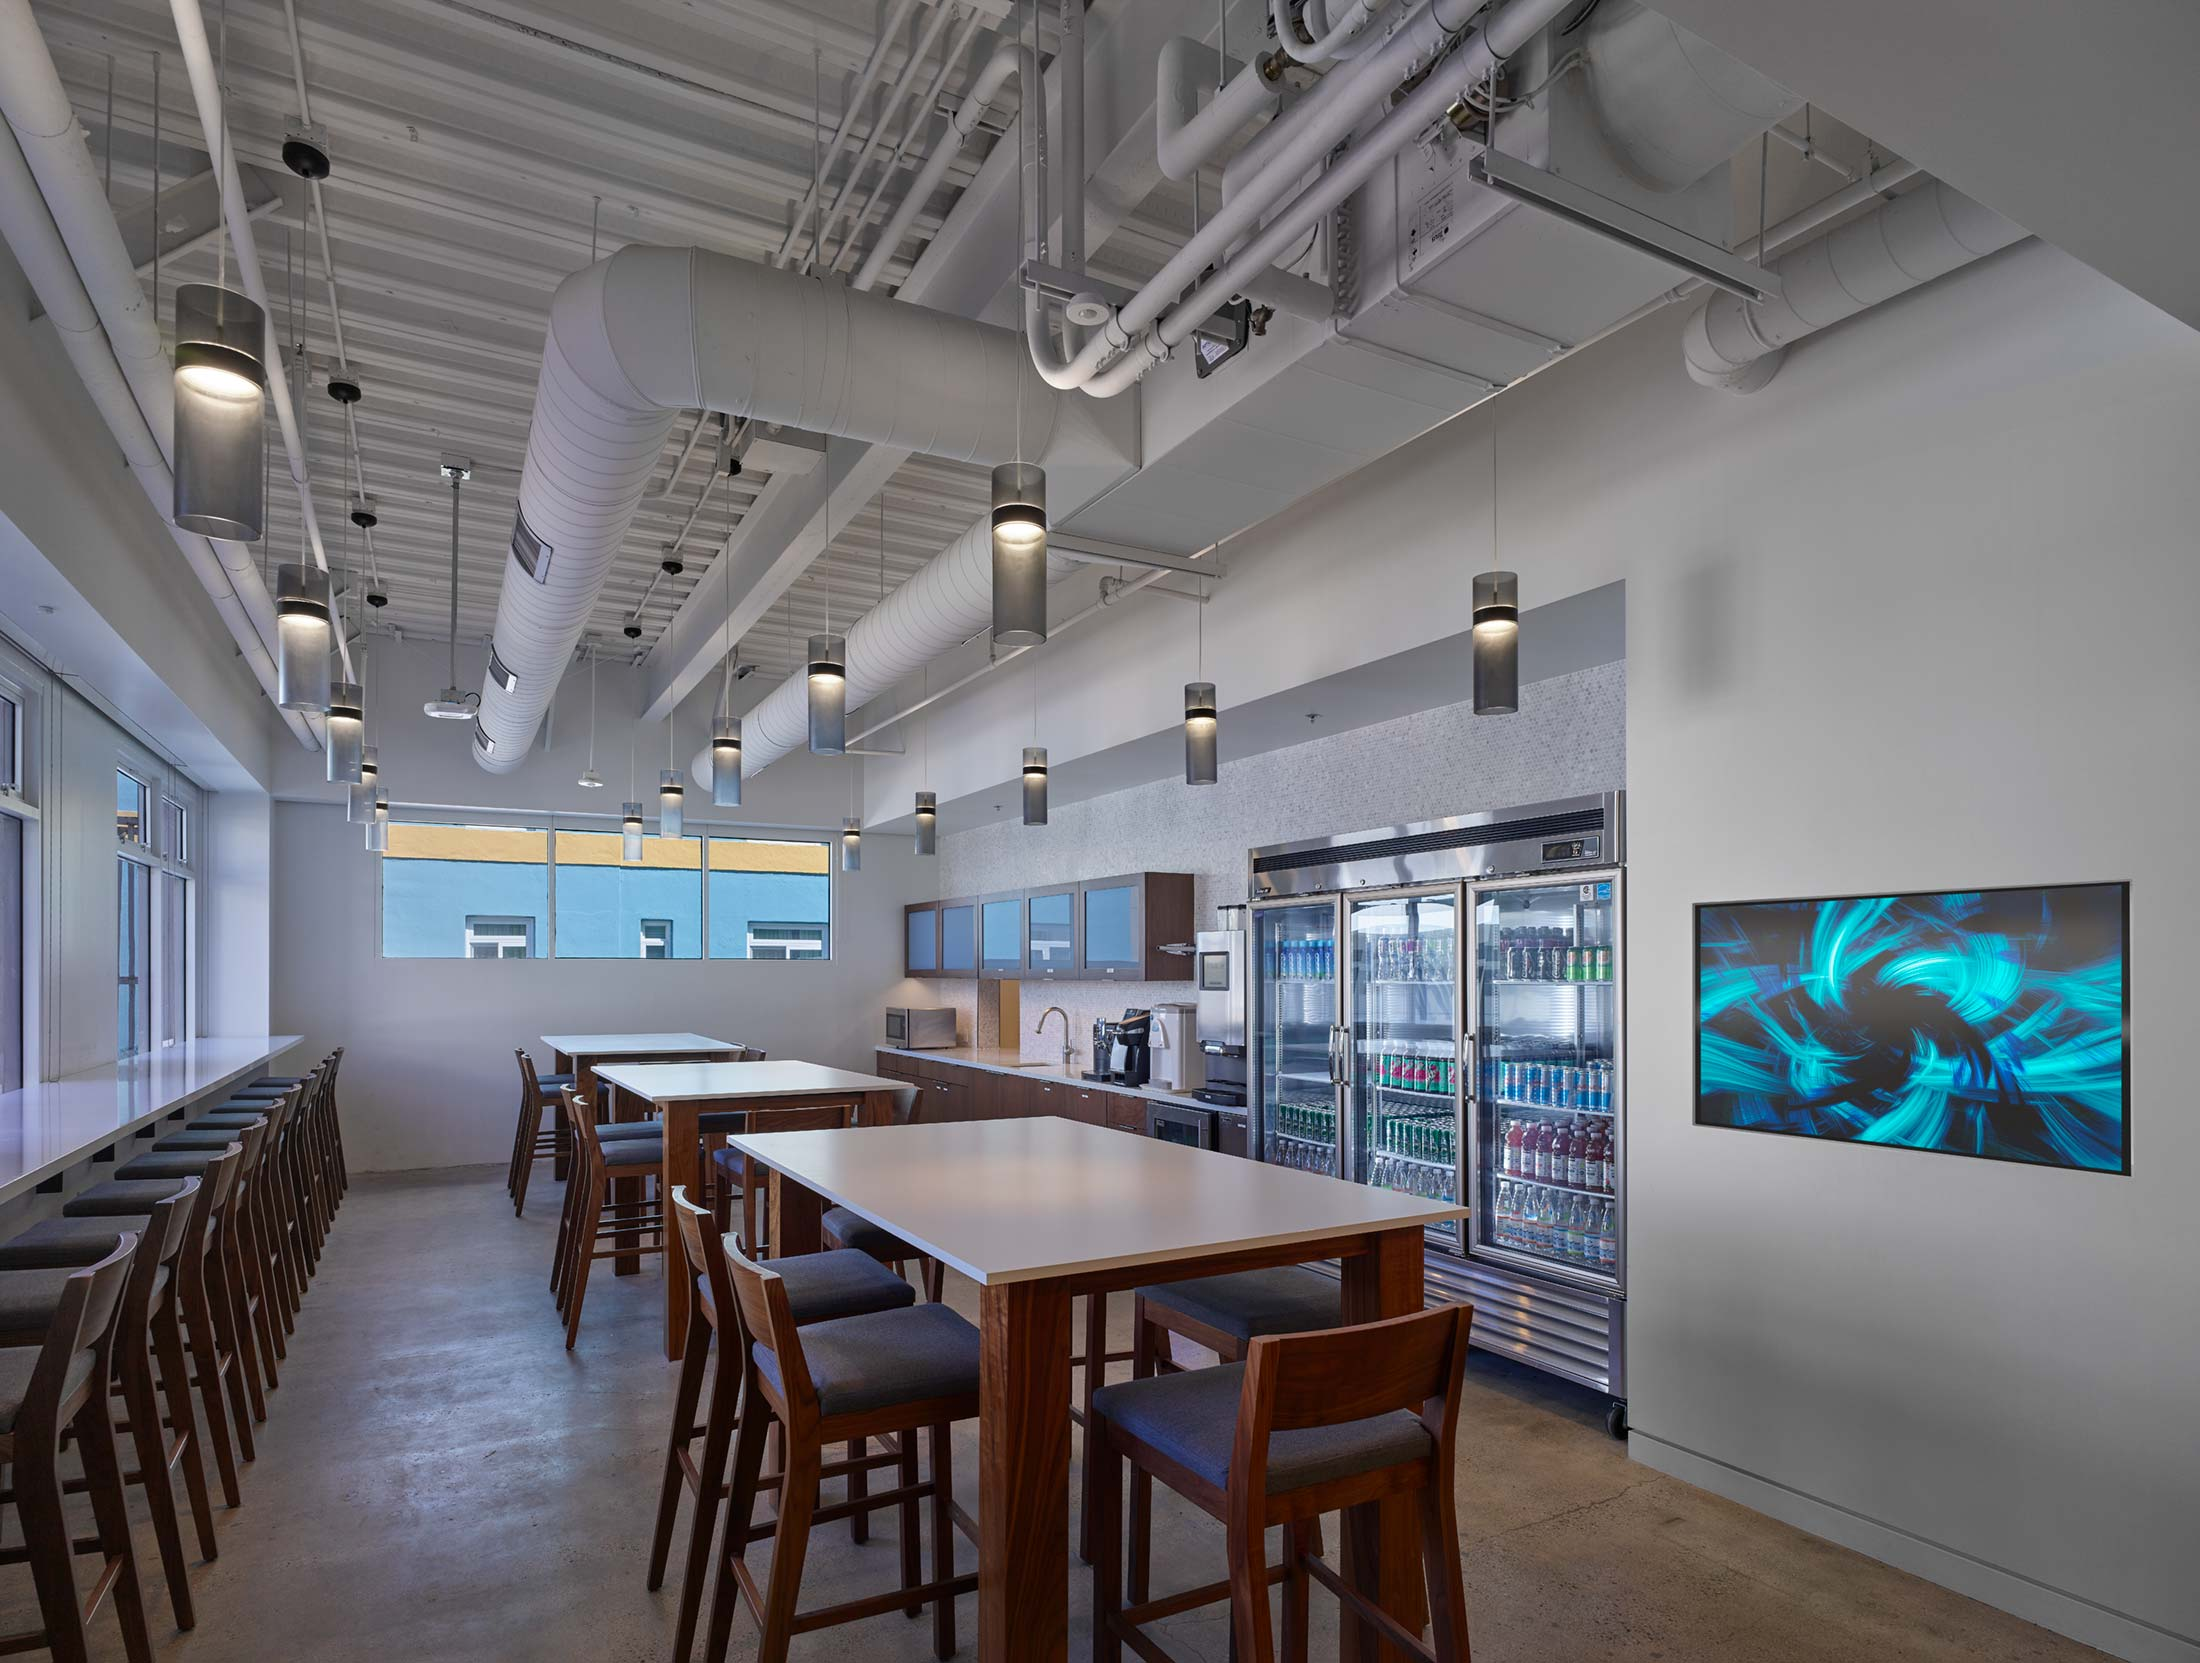 modern-architecture-commercial-interiors-office-california-shubindonaldson-truecar-ocean-09